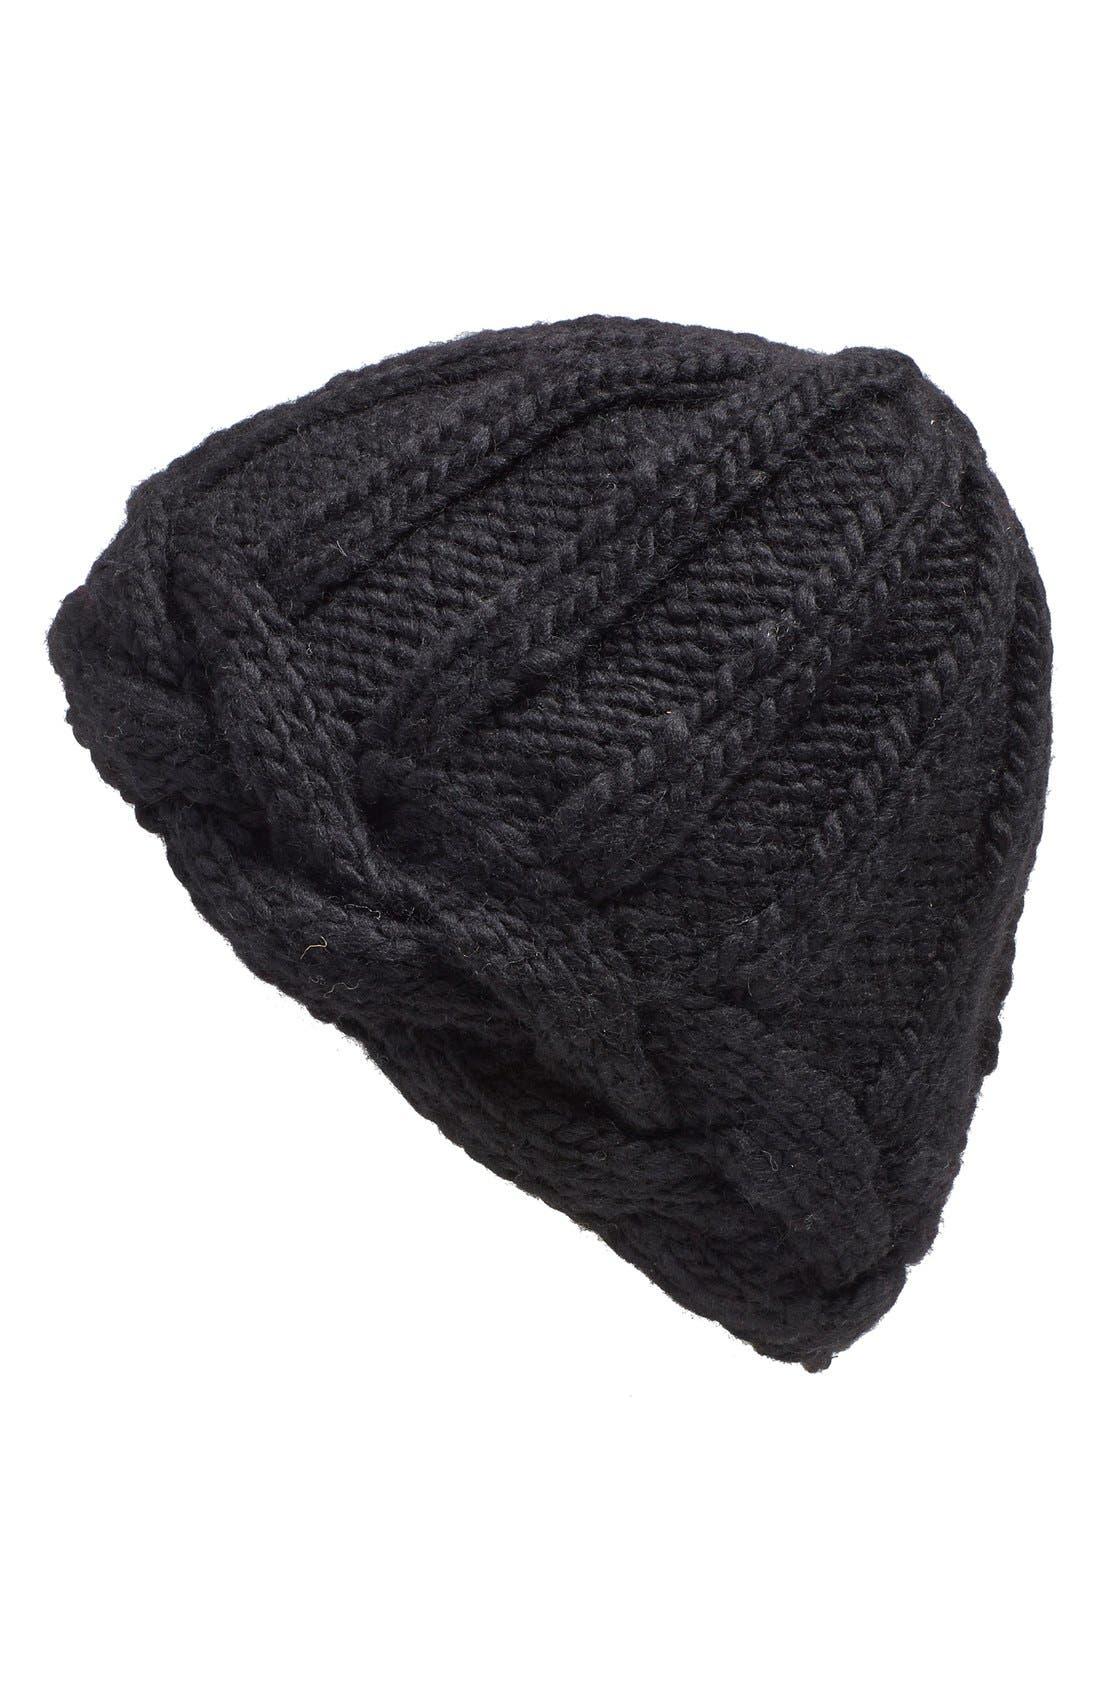 Alternate Image 1 Selected - Nirvanna Designs Braided Edge Knit Beanie